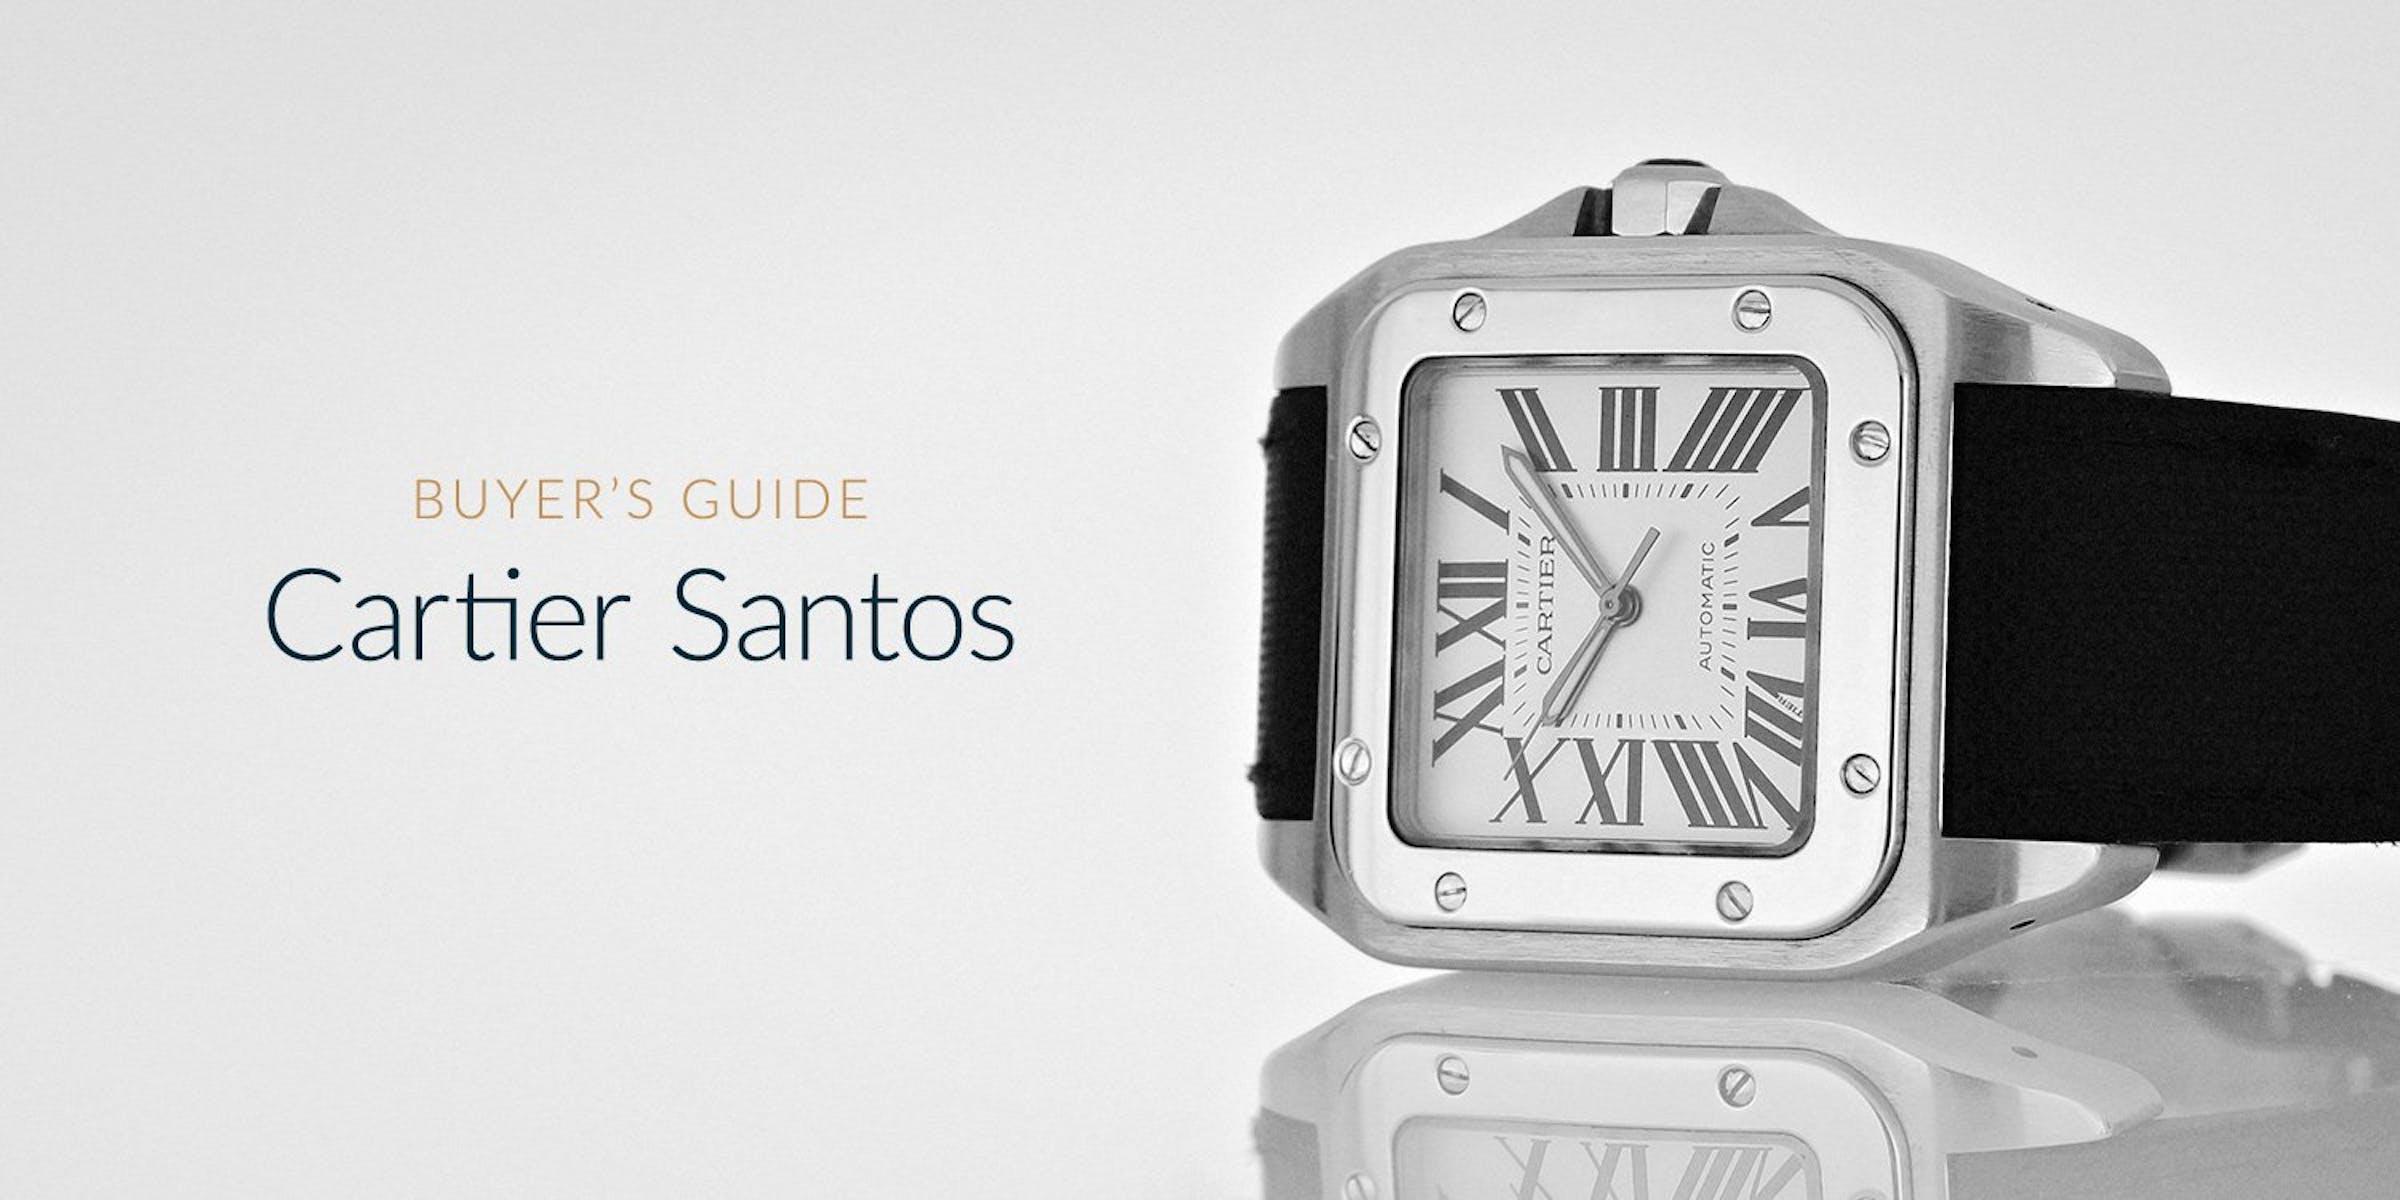 CAM-1387-Buyers-Guide-Cartier-Santos-2-1-DE